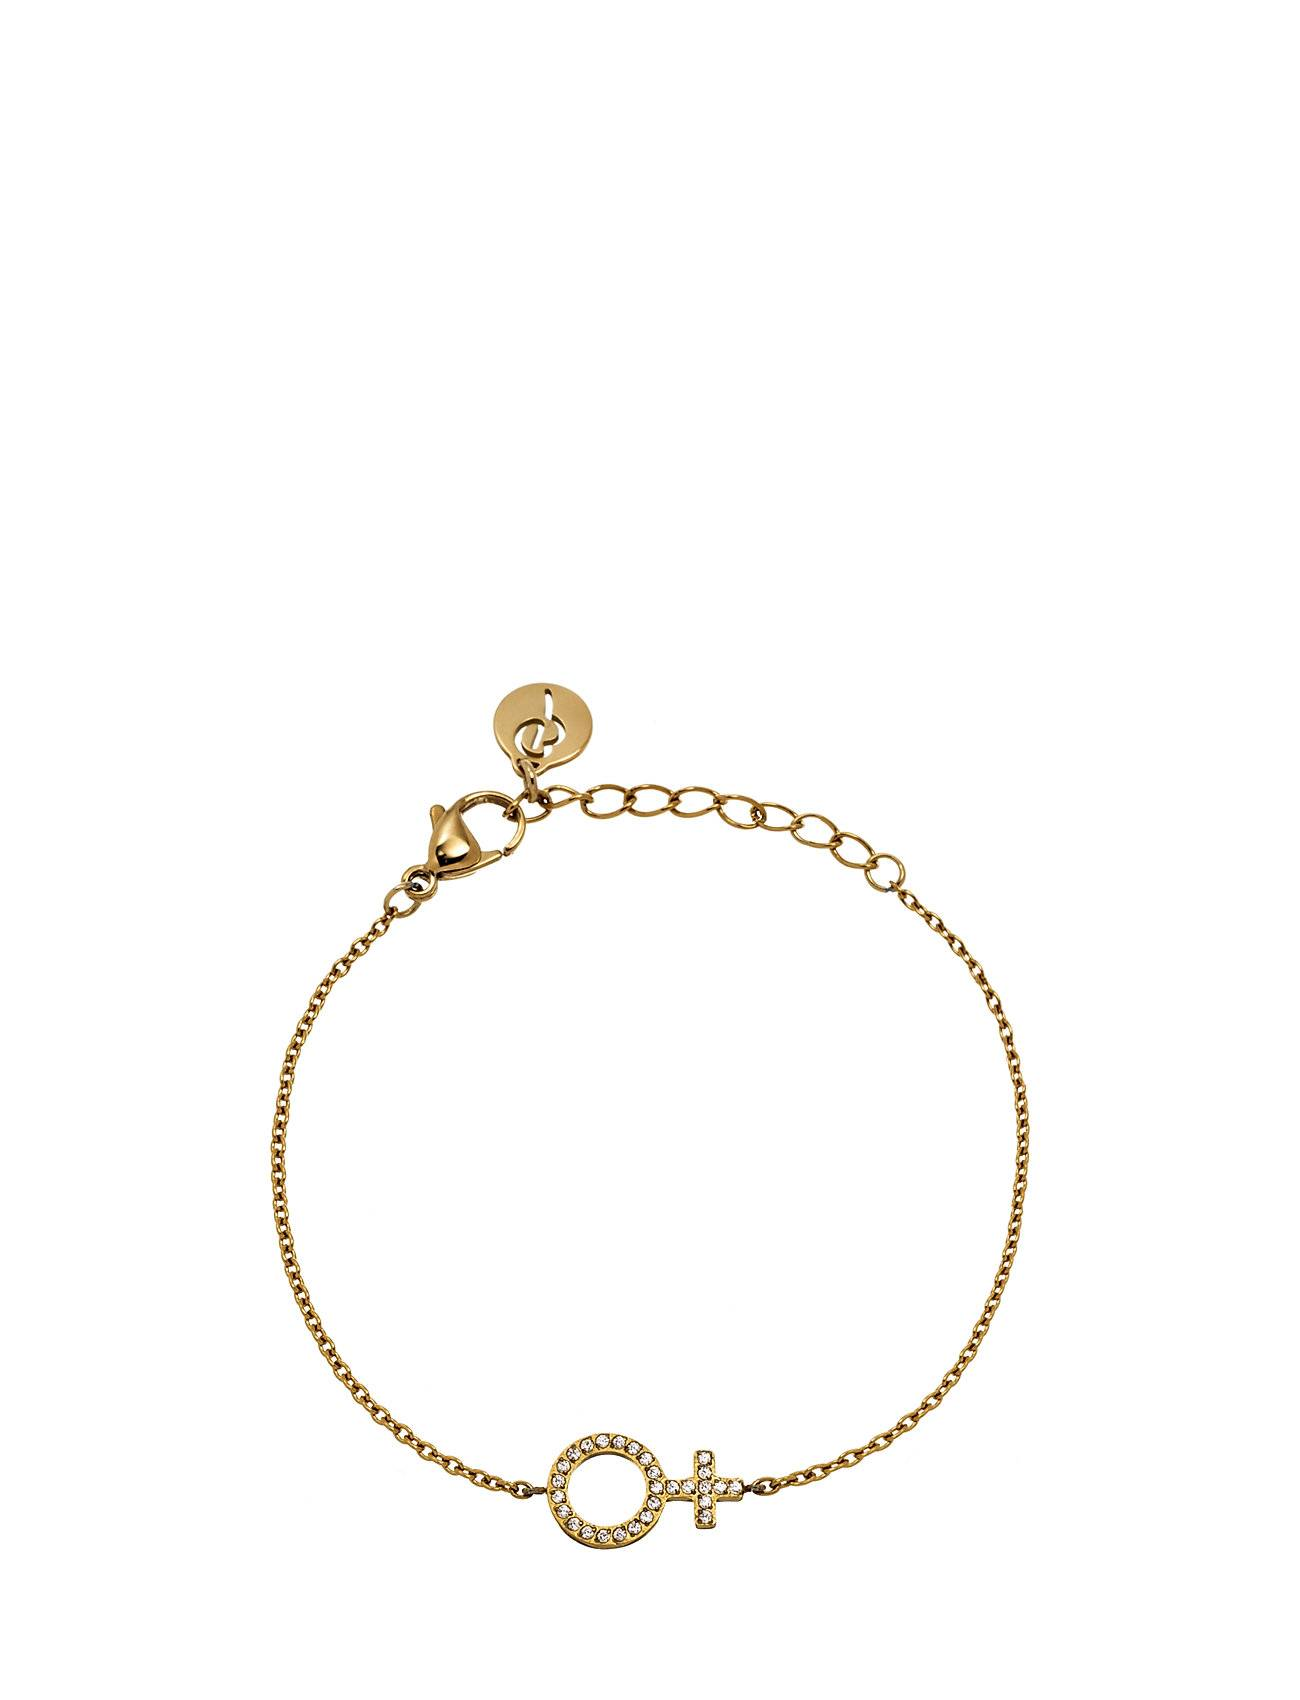 Edblad Me Bracelet Gold Accessories Jewellery Bracelets Chain Bracelets Kulta Edblad